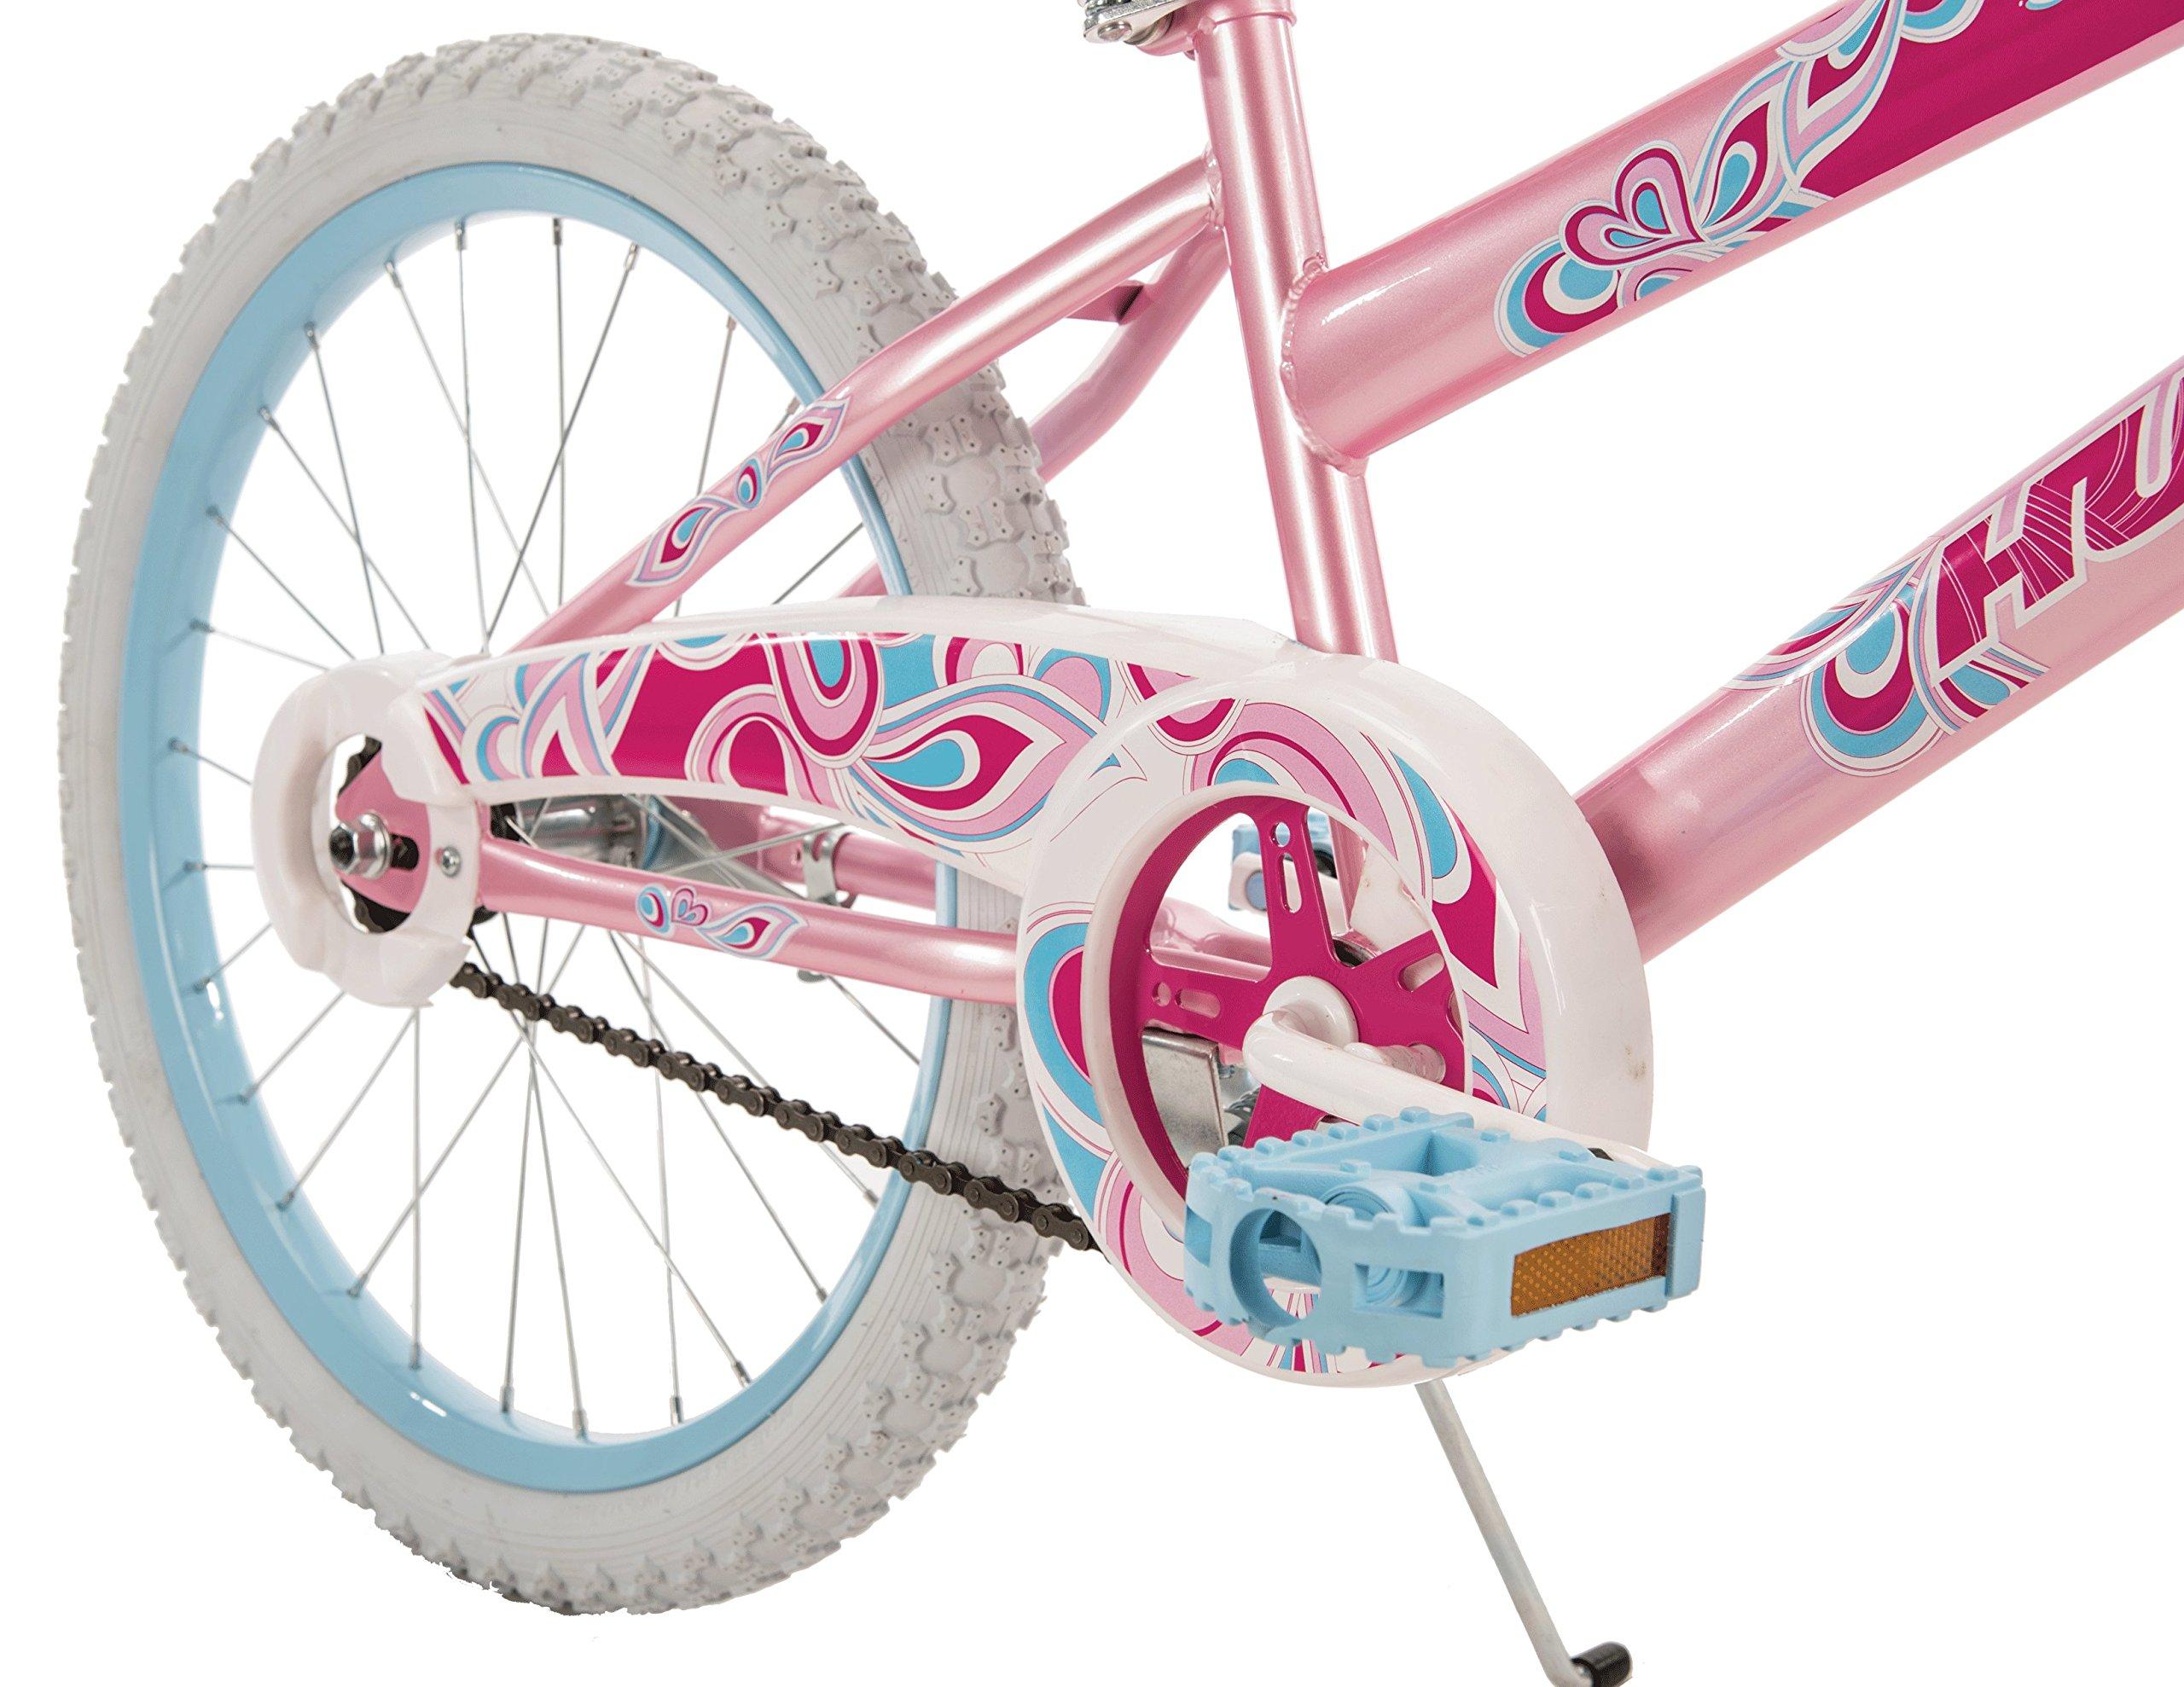 Huffy Bicycle Company So Sweet Single-Speed Girls' Bike, Bubblegum Pink, 20''